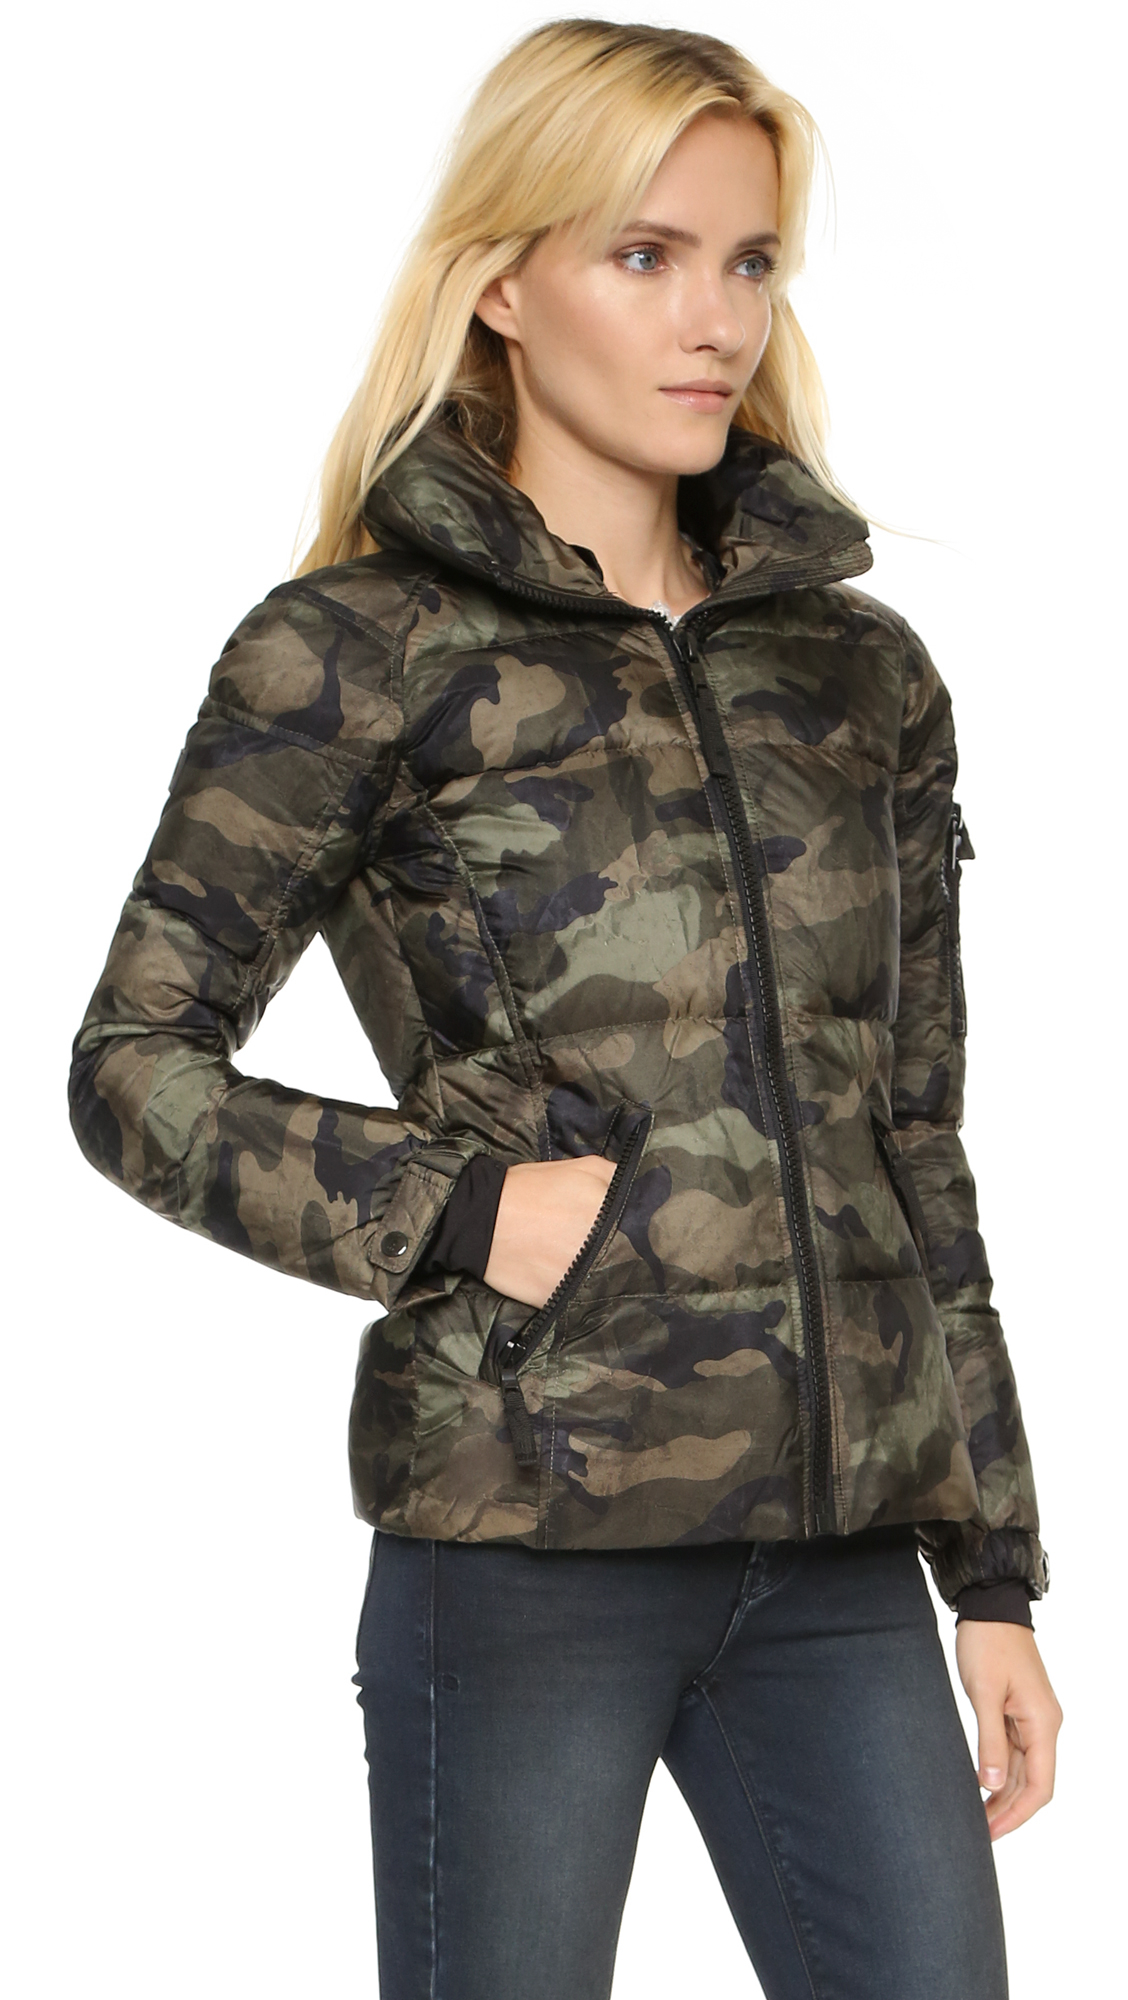 Camo jacket for women fashion